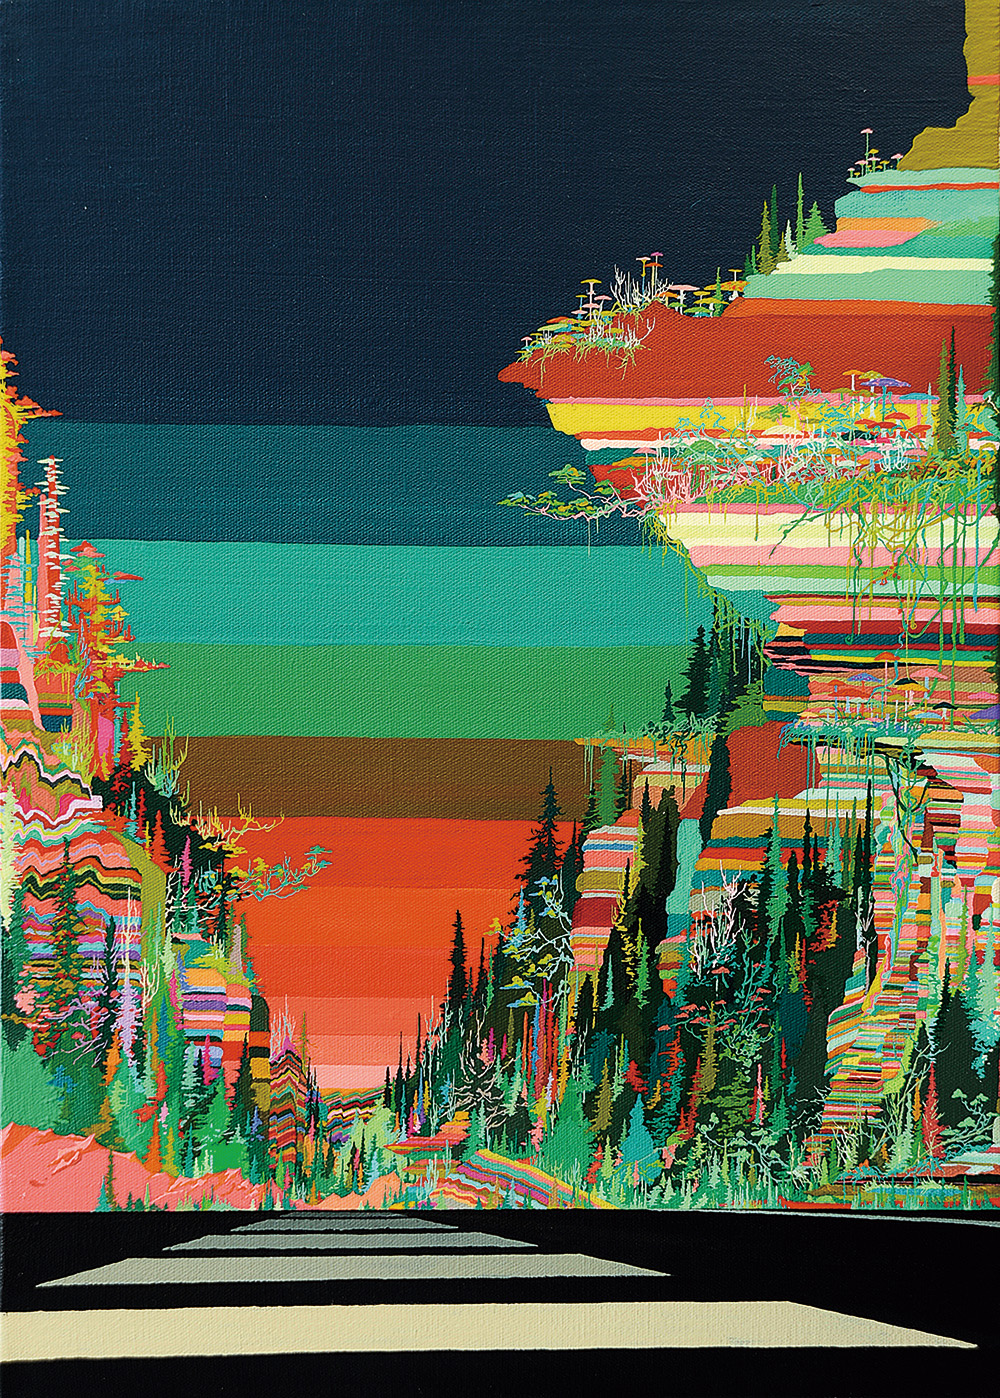 Zhou Fan 周范, Landscape 01:50 风景 01:50, 2015, Acrylic on canvas 布面丙烯, 70 x 51 cm